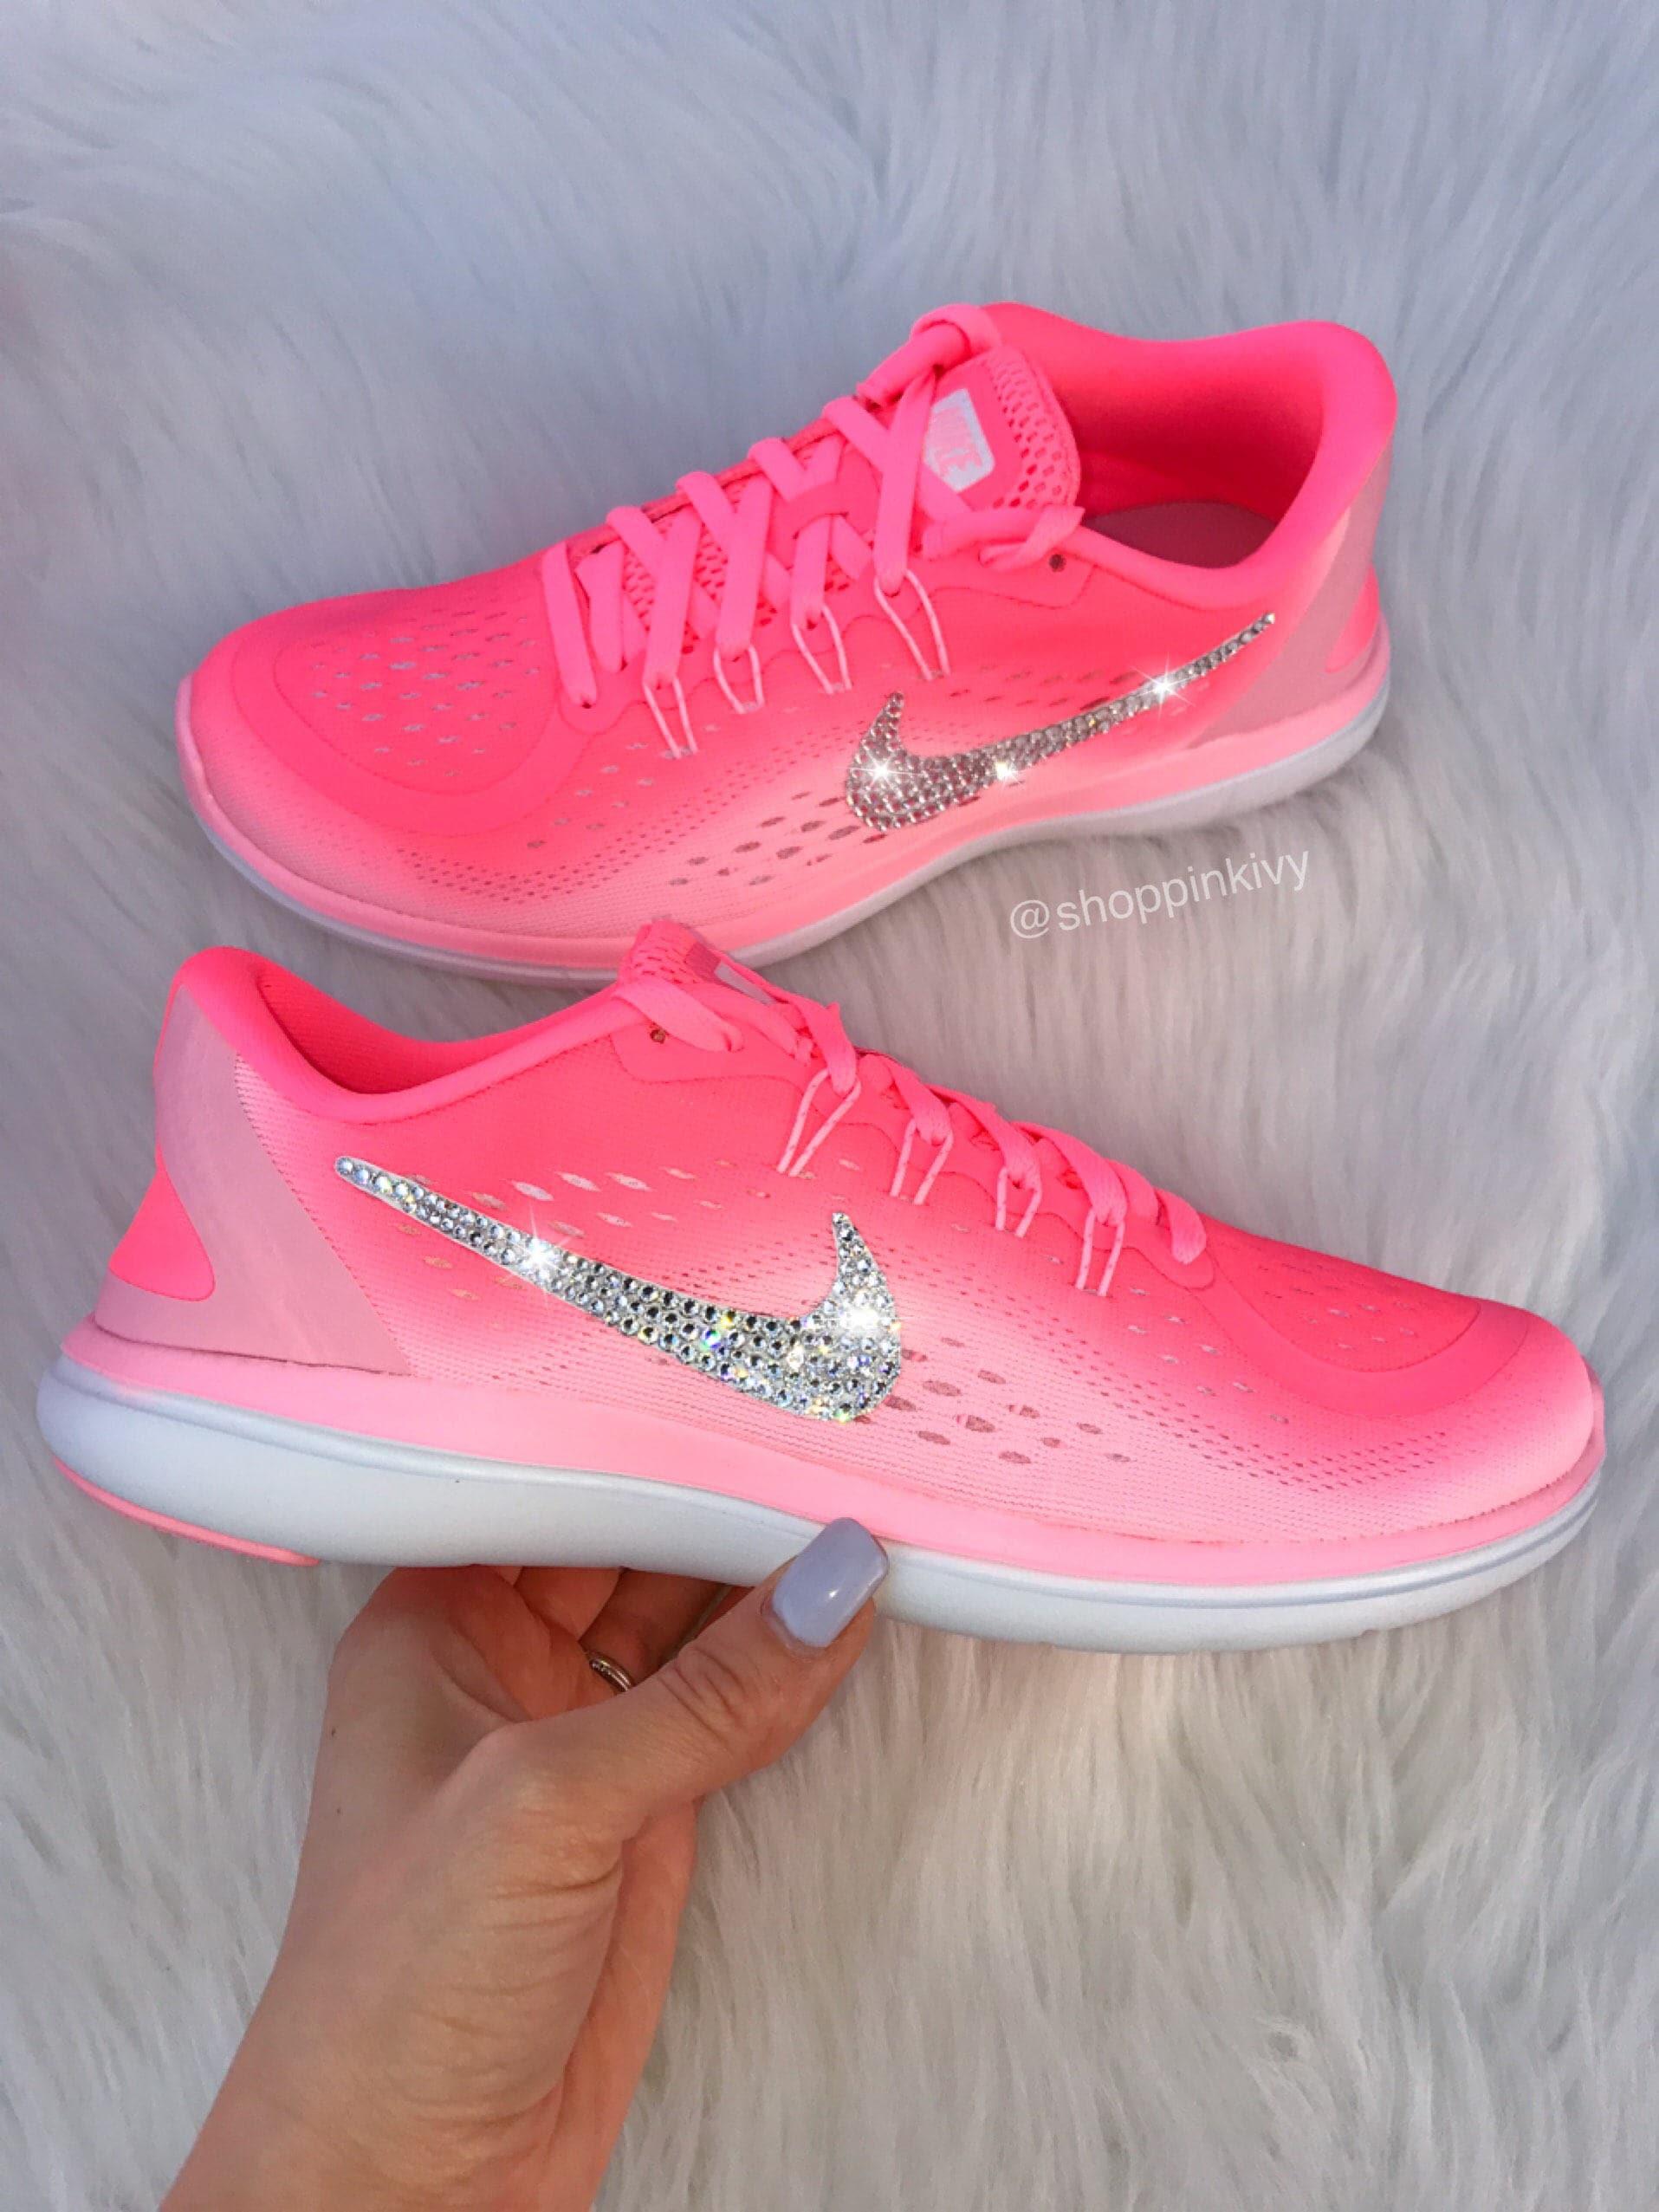 f2a8f0b03d3ee Swarovski Nike Flex Running Shoes Customized With Swarovski